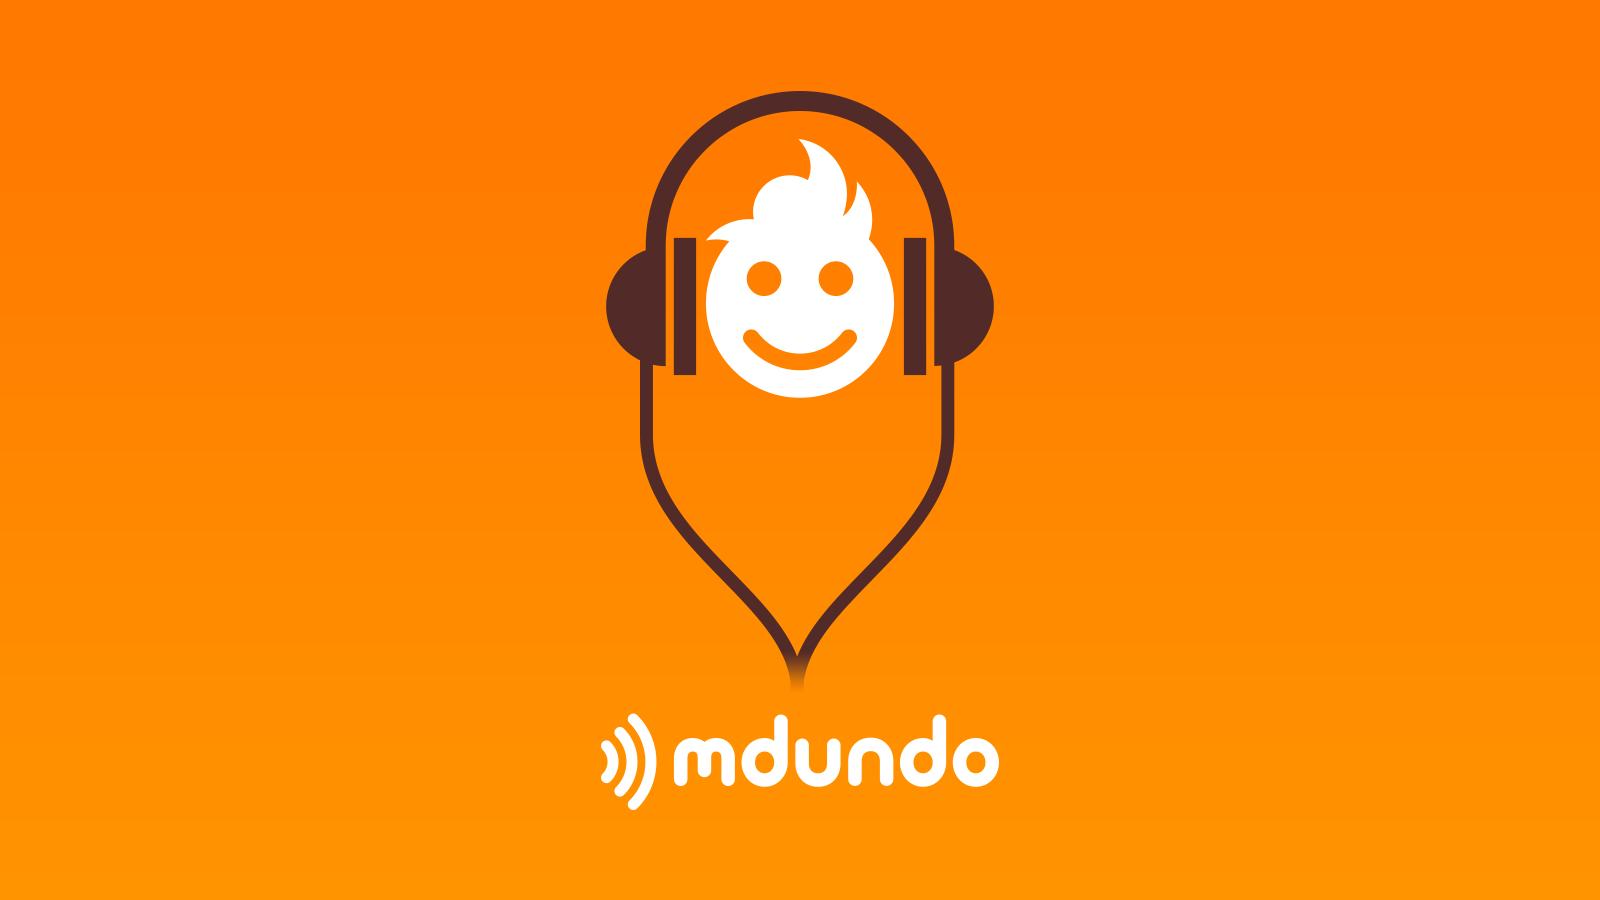 mdundo-logo-1600x900